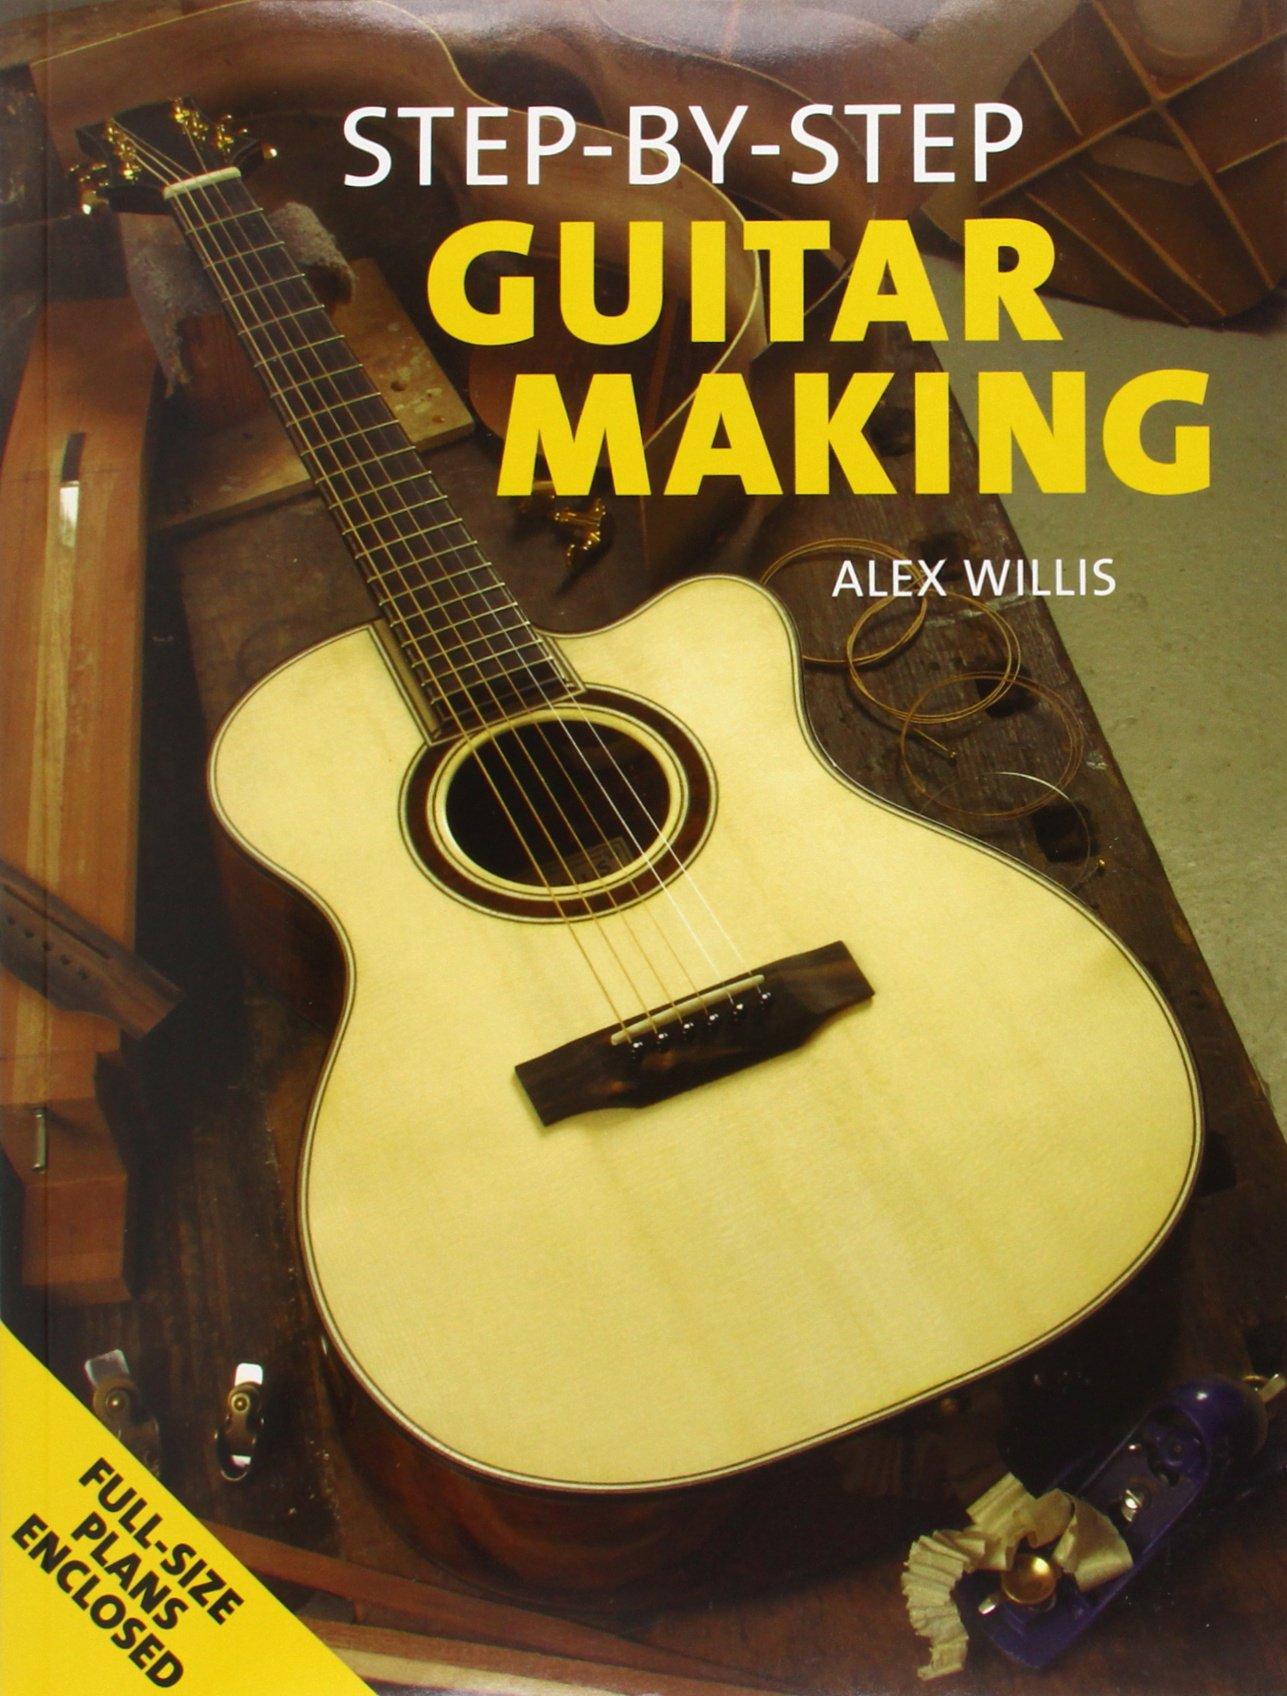 Step-By-Step Guitar Making